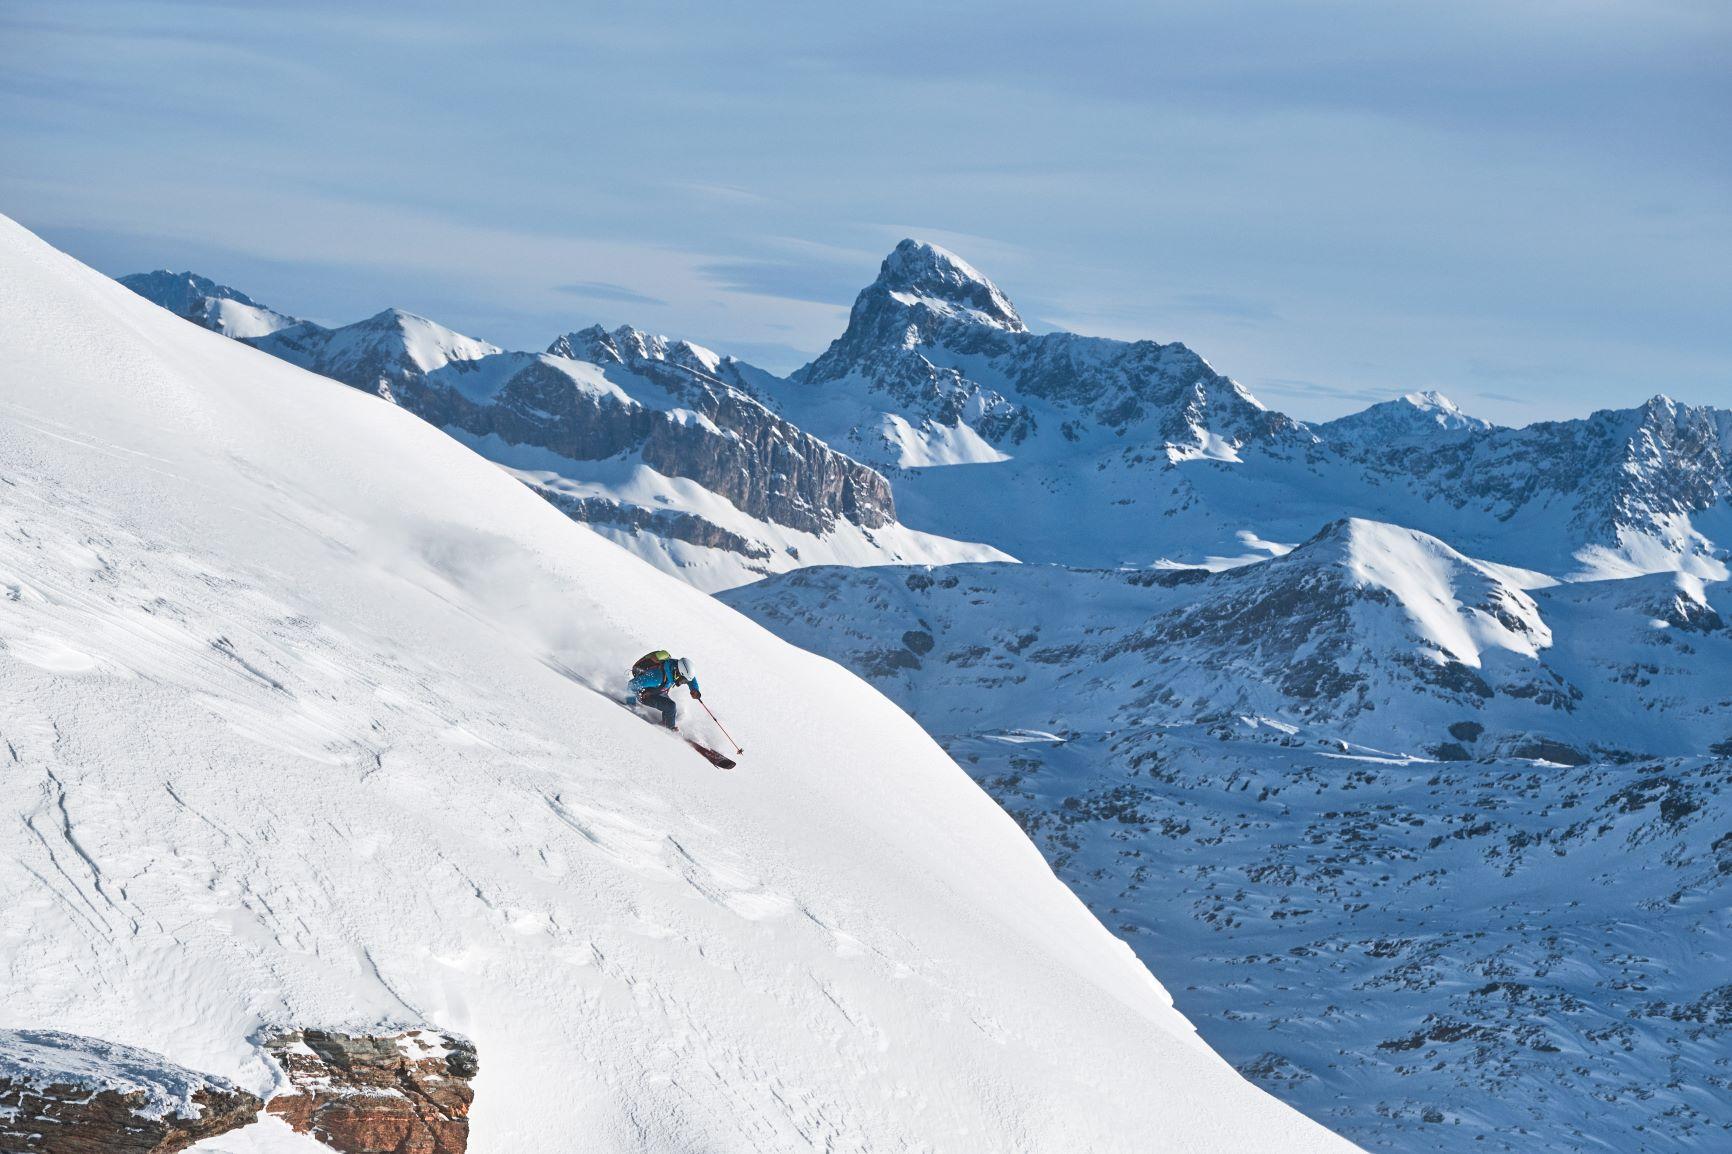 SkischuhfttingSkier